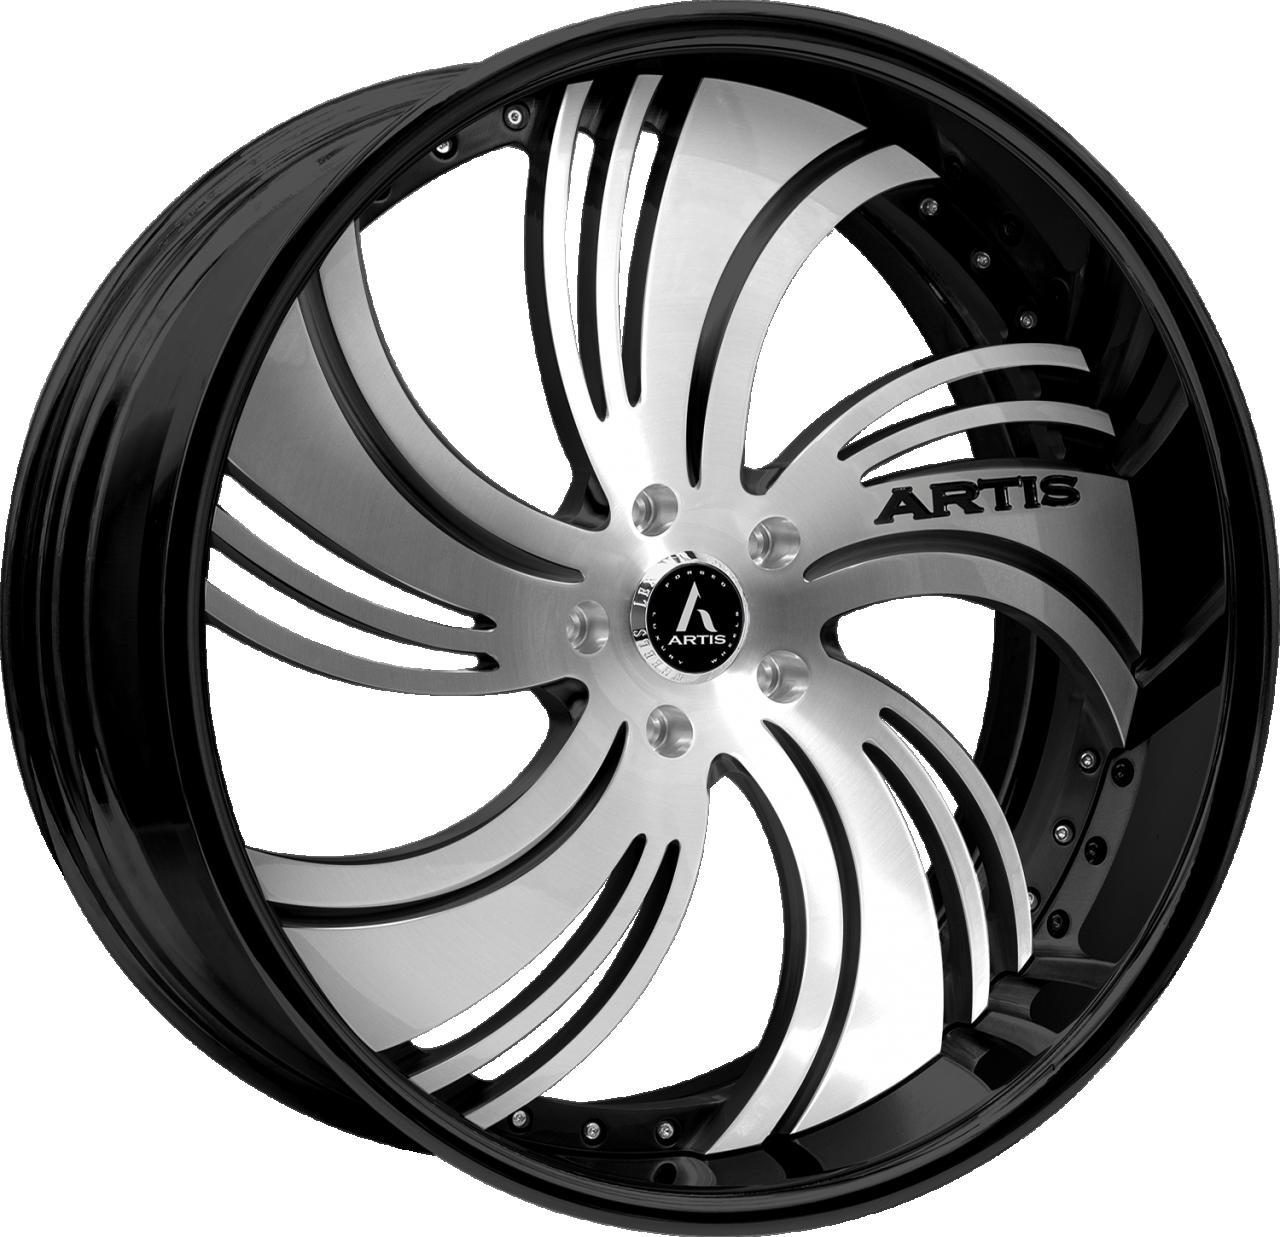 Artis Forged Avenue wheel with Custom finish